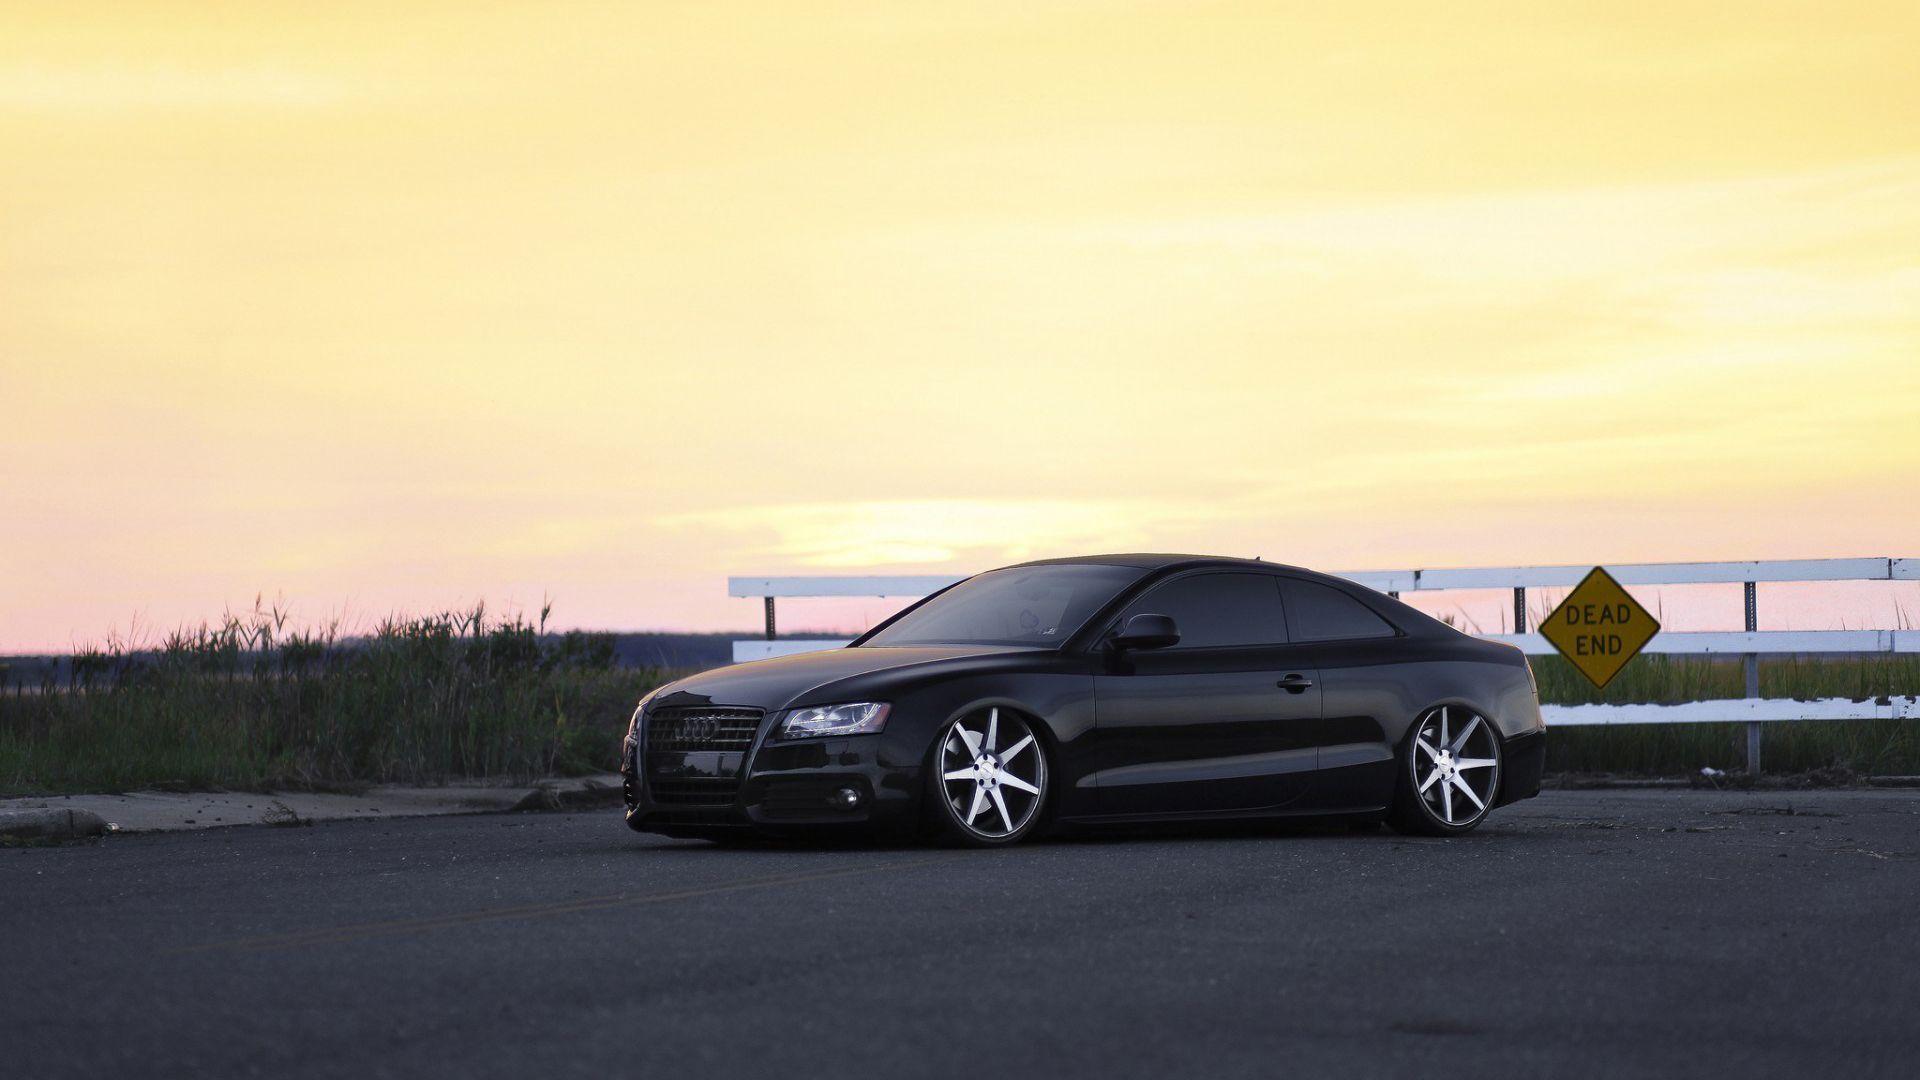 Lowest Car Insurance Rates Httpcomparesautosinsurancesratesnet - Audi car insurance